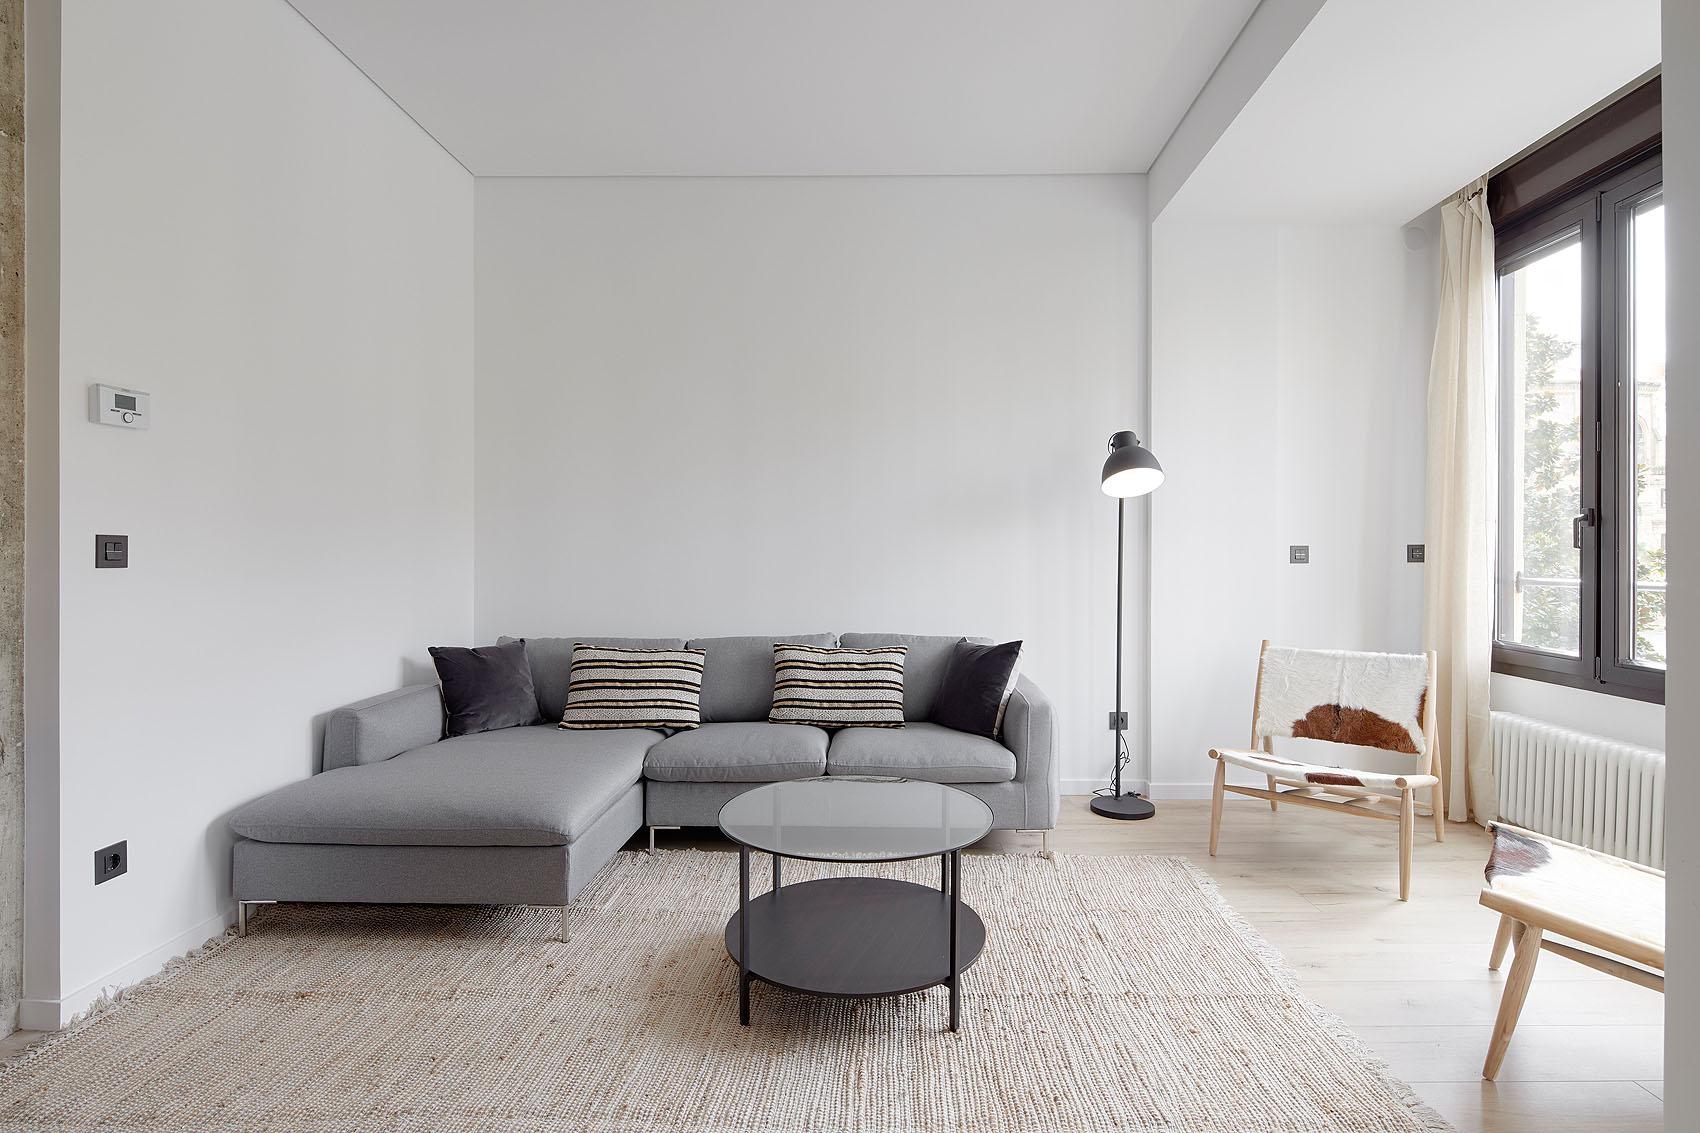 Apartamento San Francisco - Iñaki Caperochipi - Fotografía